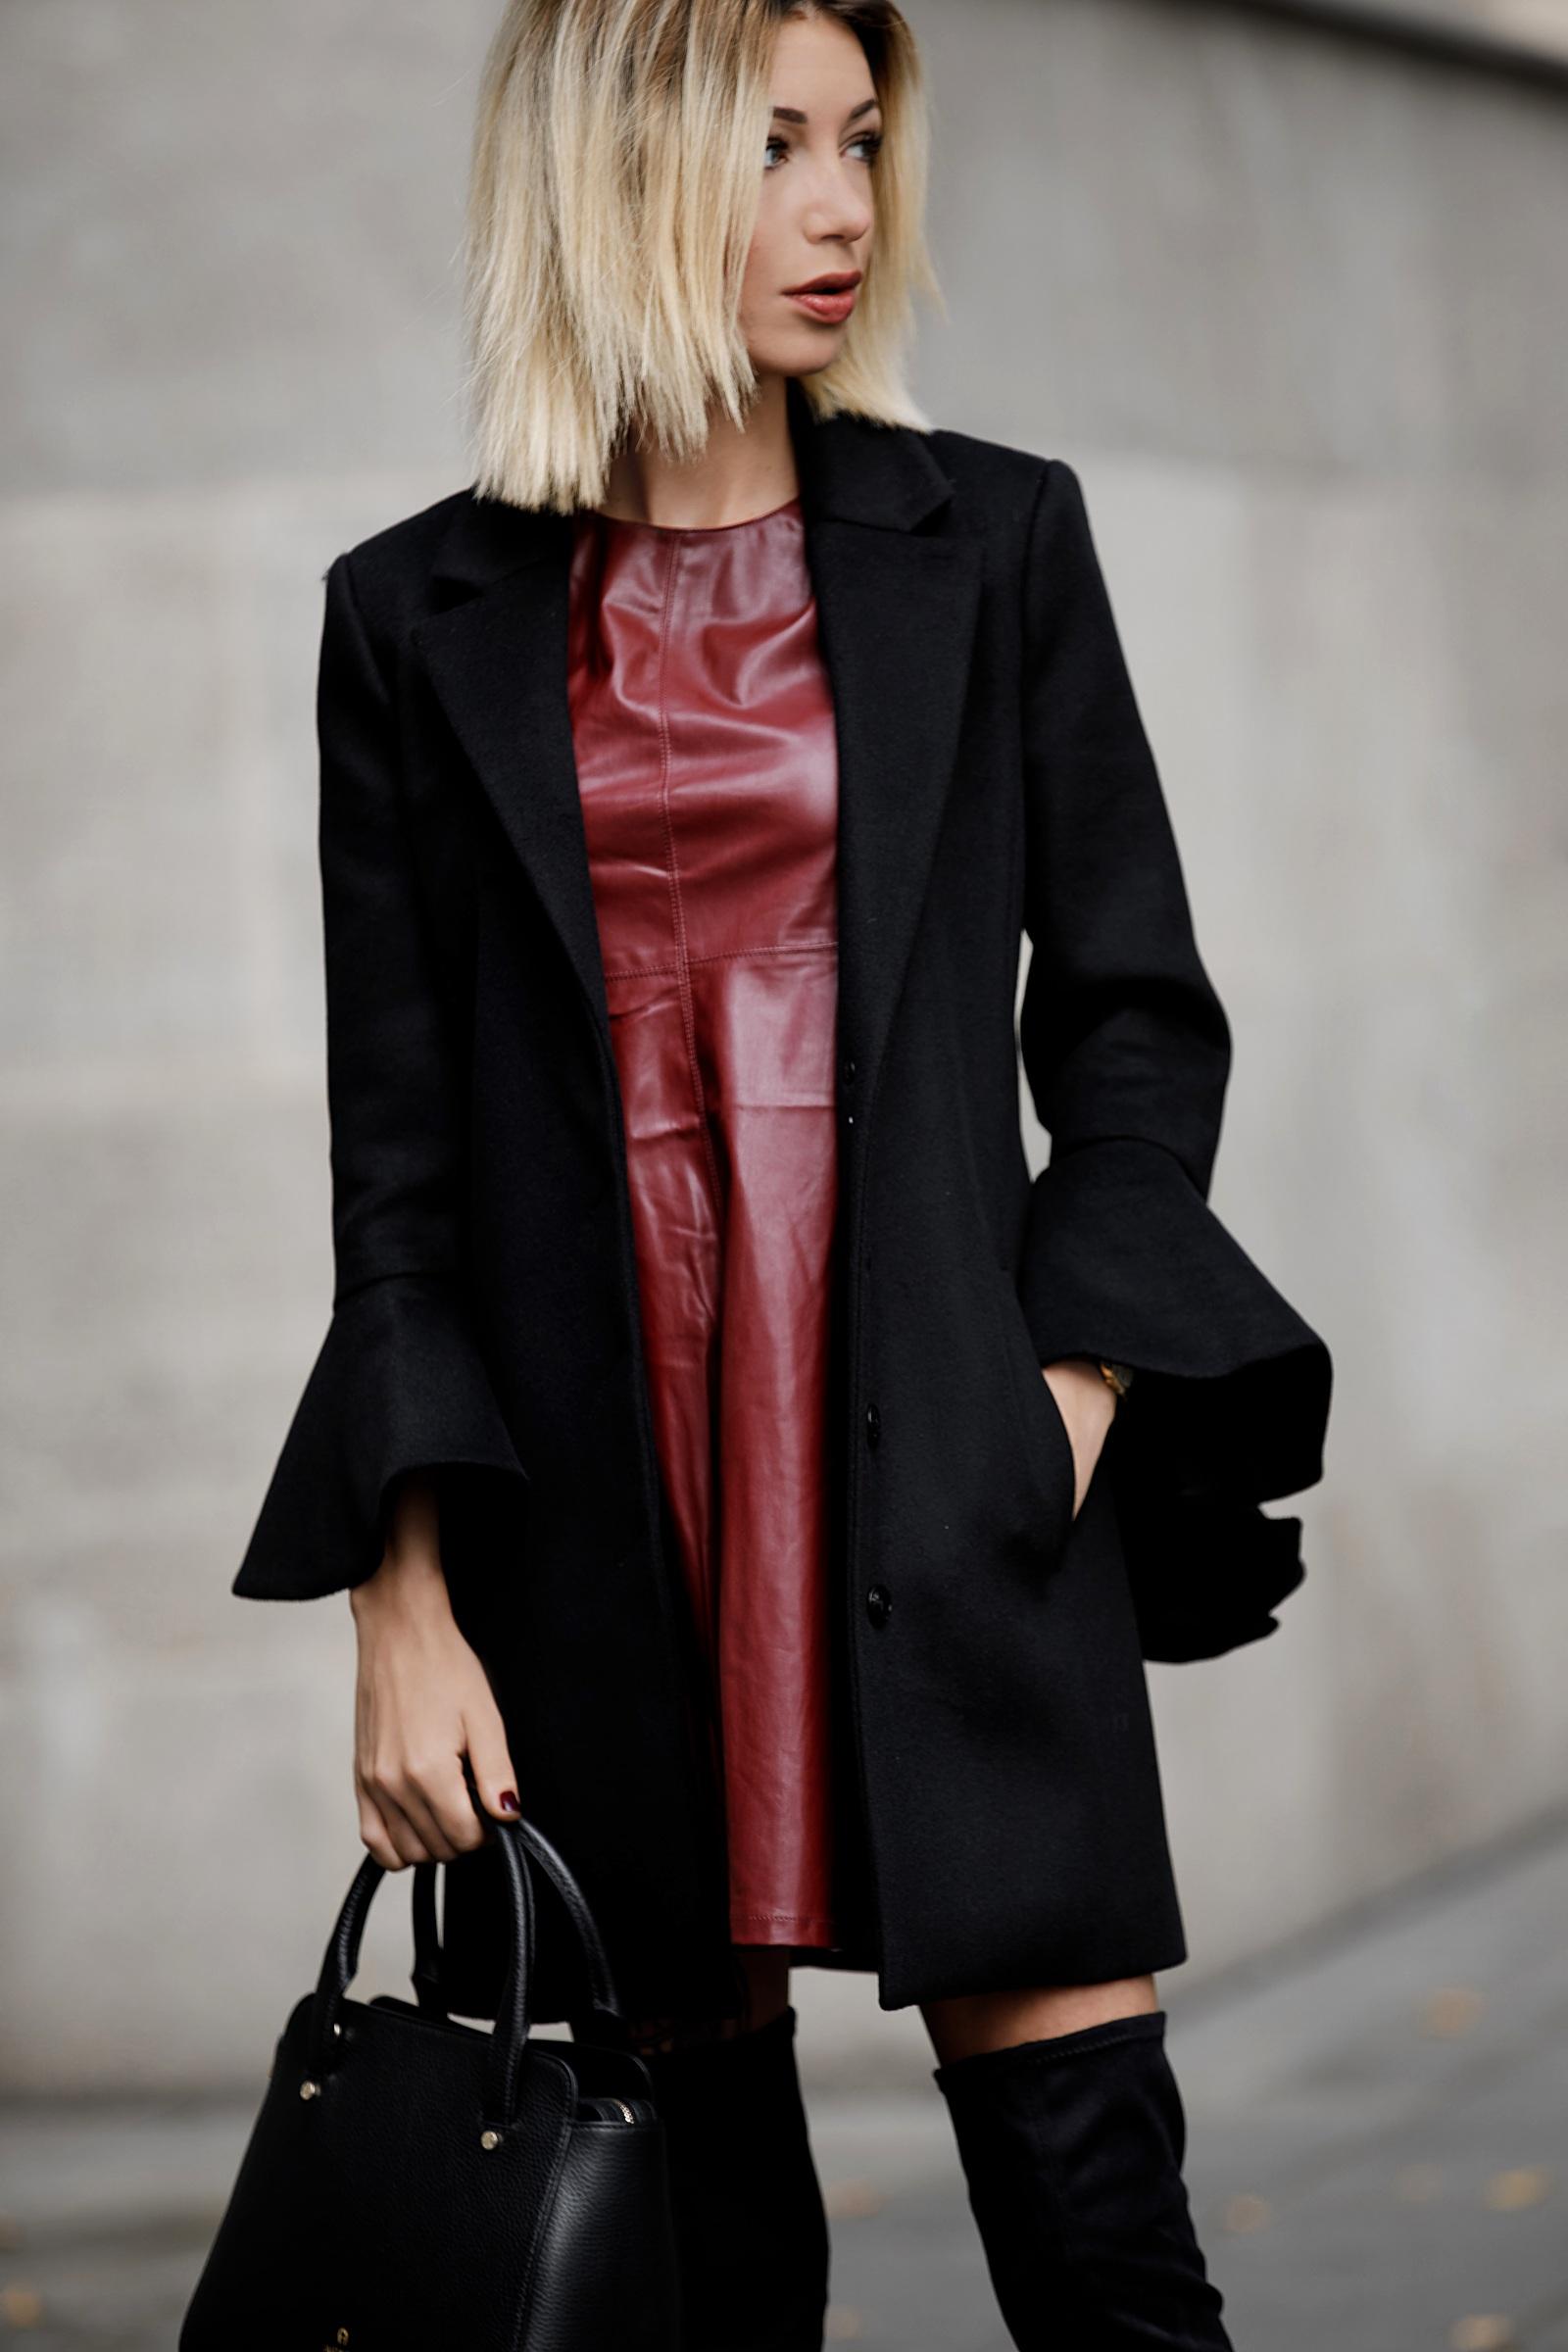 fashionblog-deutschland-koeln-modeblog-streetstyle-aigner